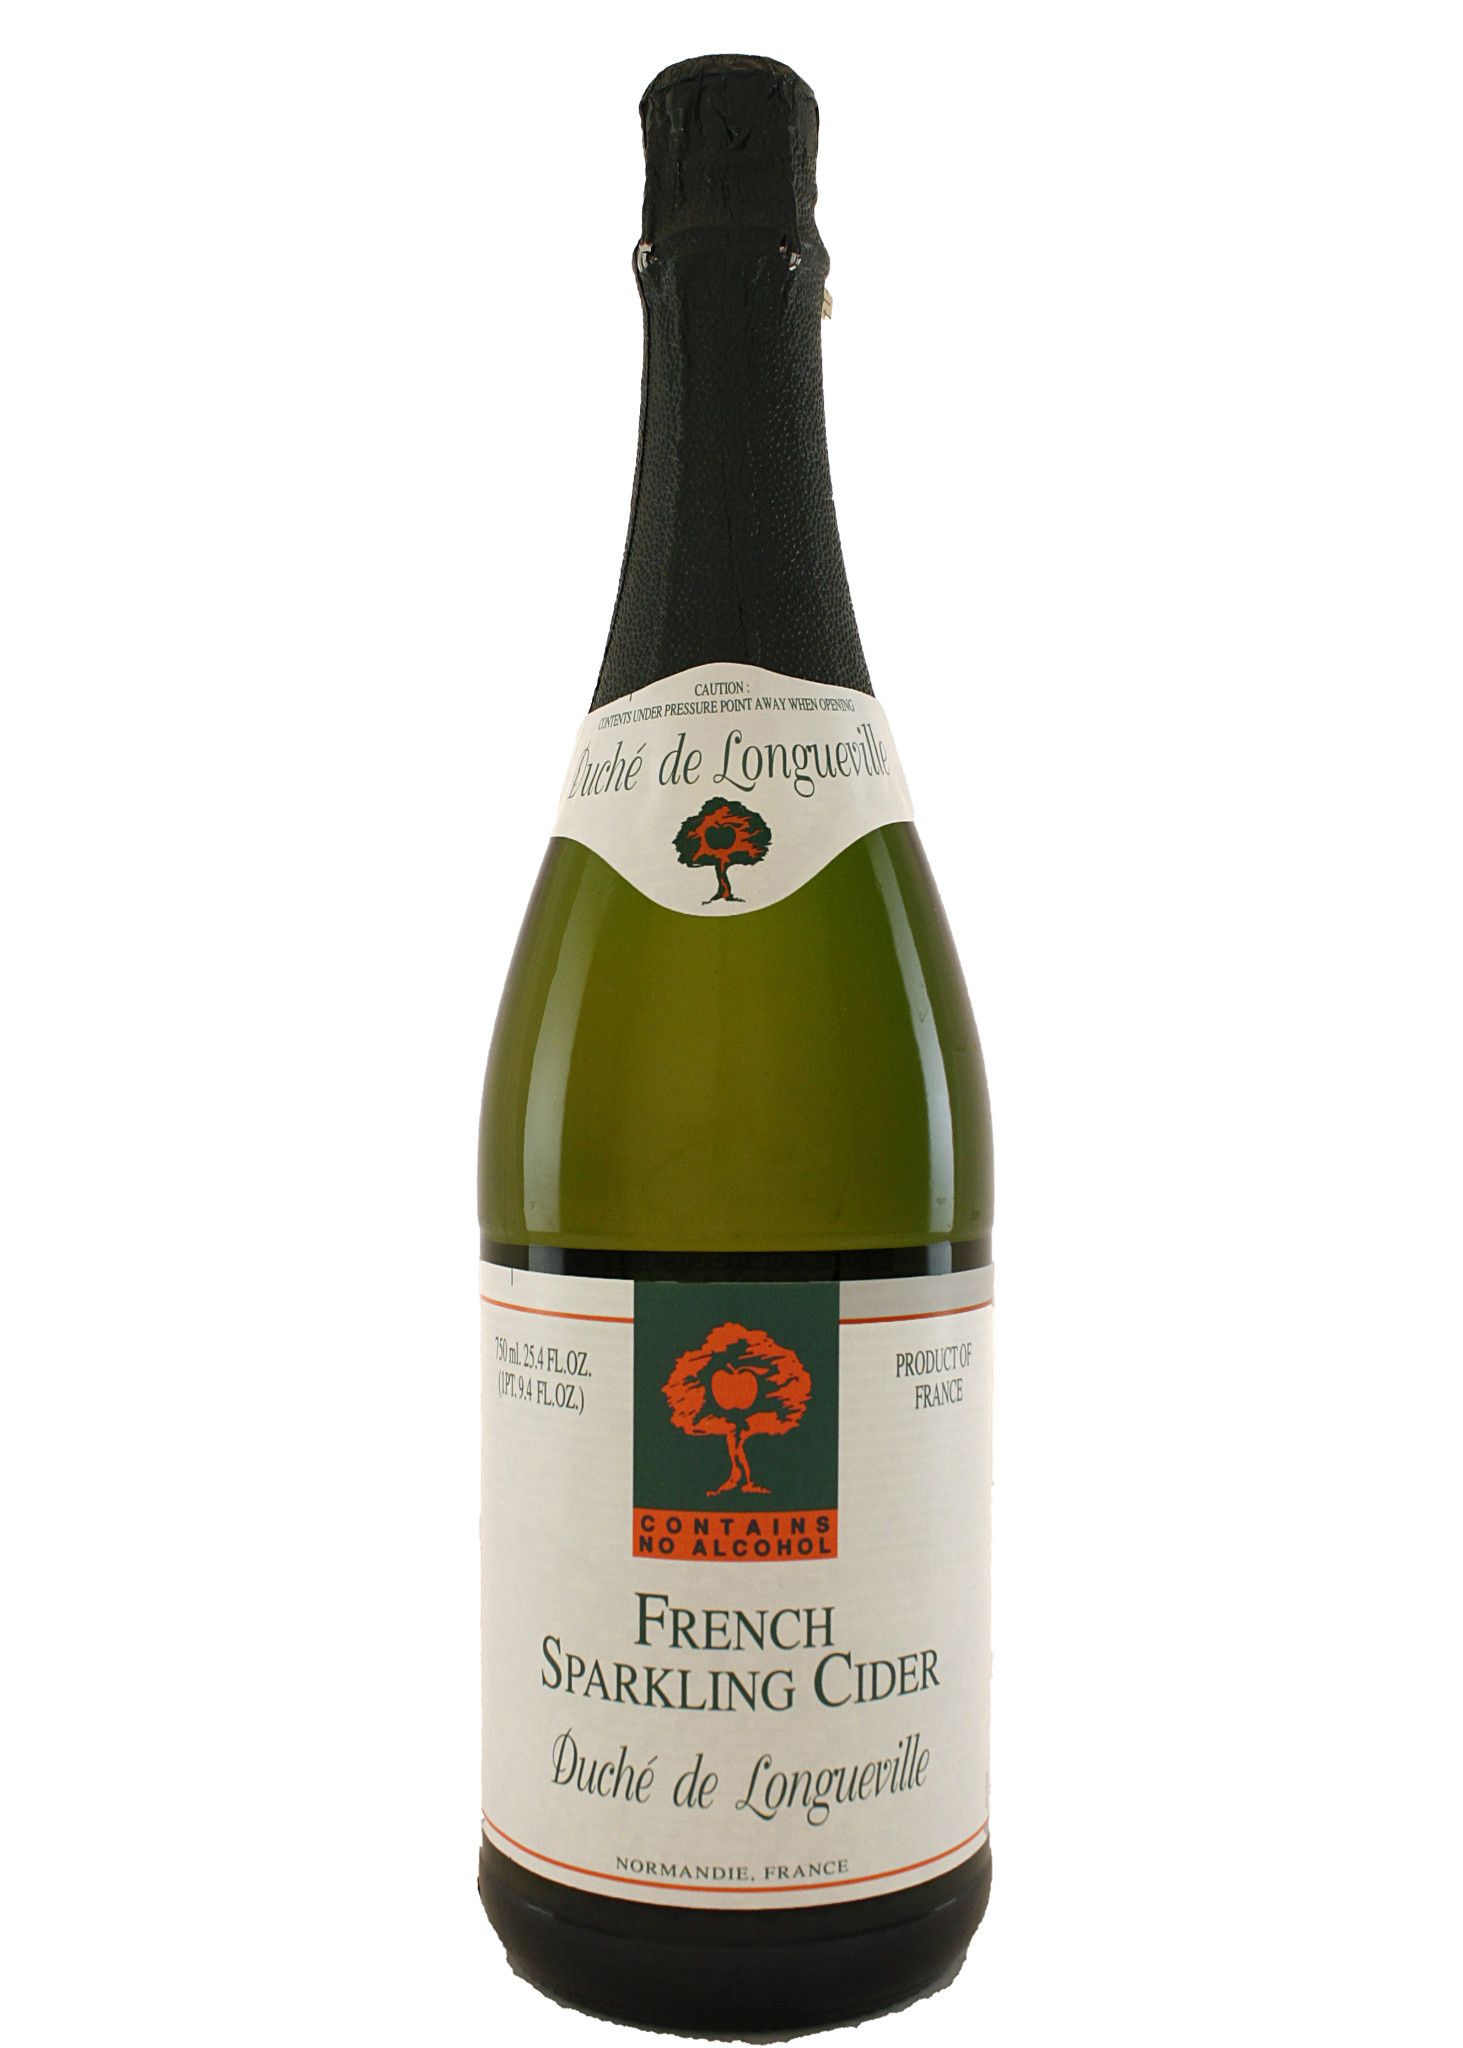 Duche de Longueville Non-Alcoholic French Sparkling Cider